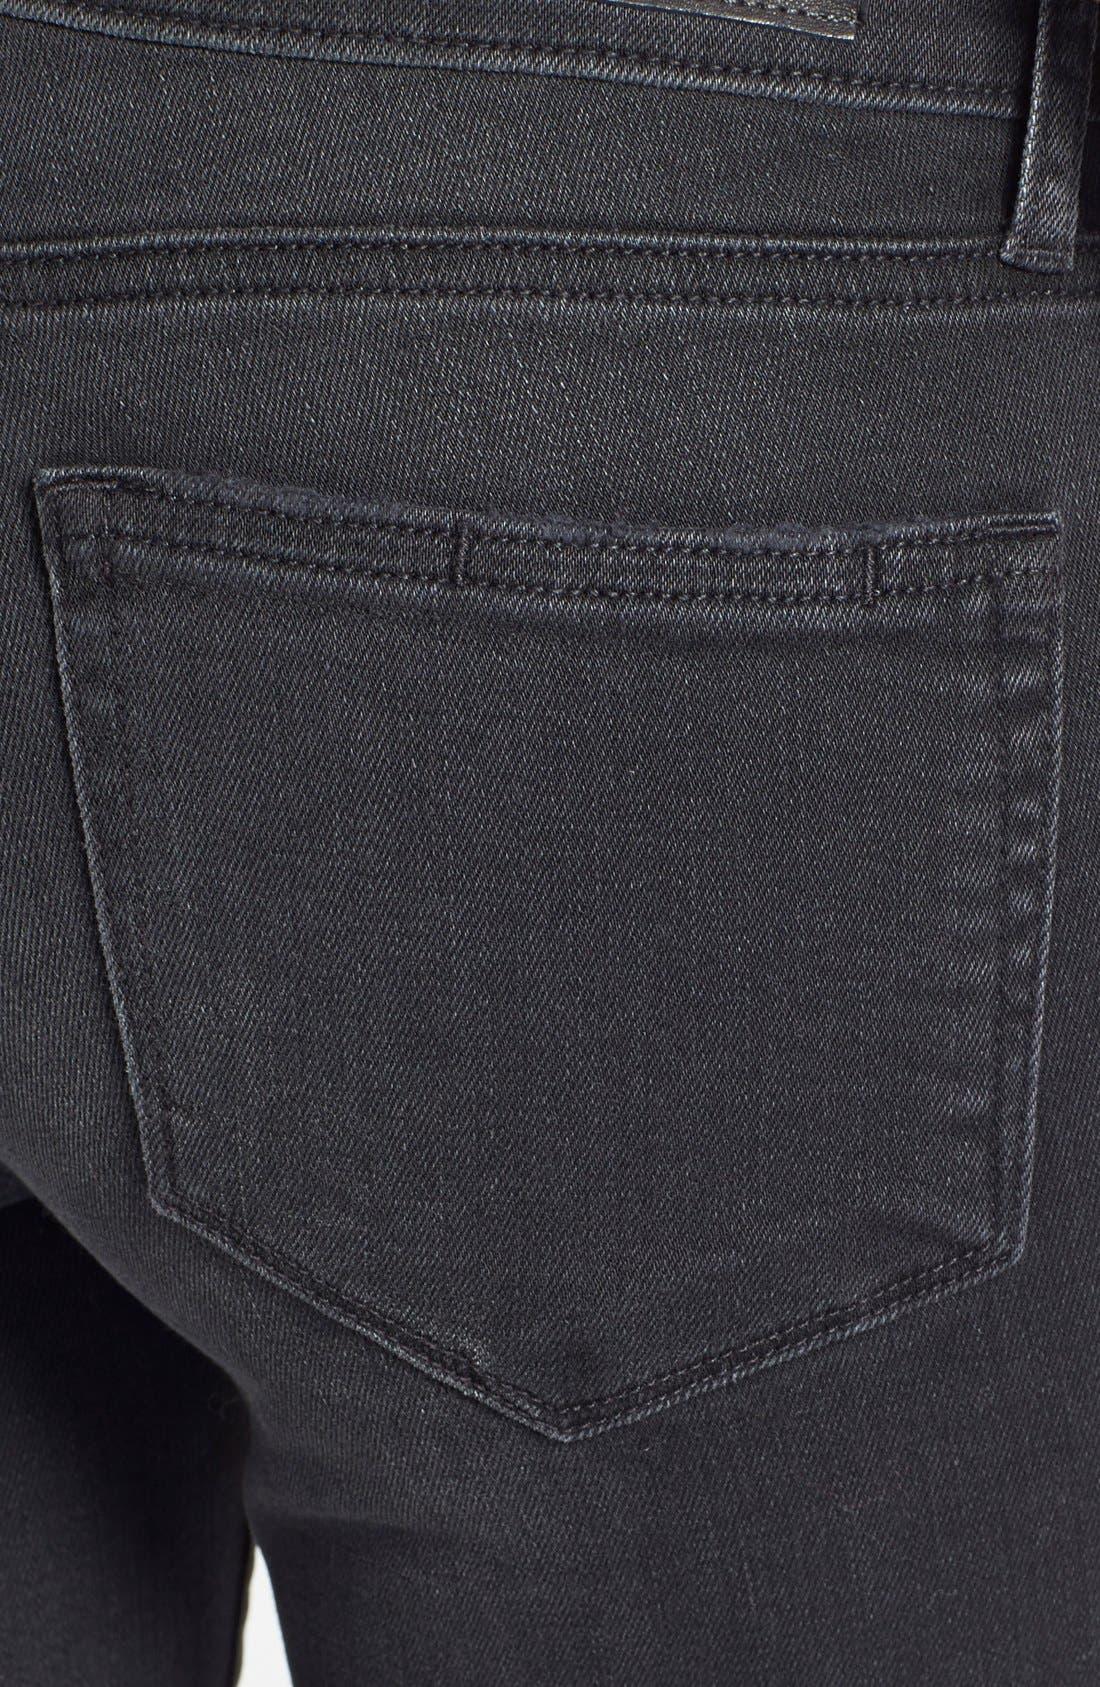 Alternate Image 3  - Paige Denim 'Verdugo' Ultra Skinny Jeans (Rayed Destructed)